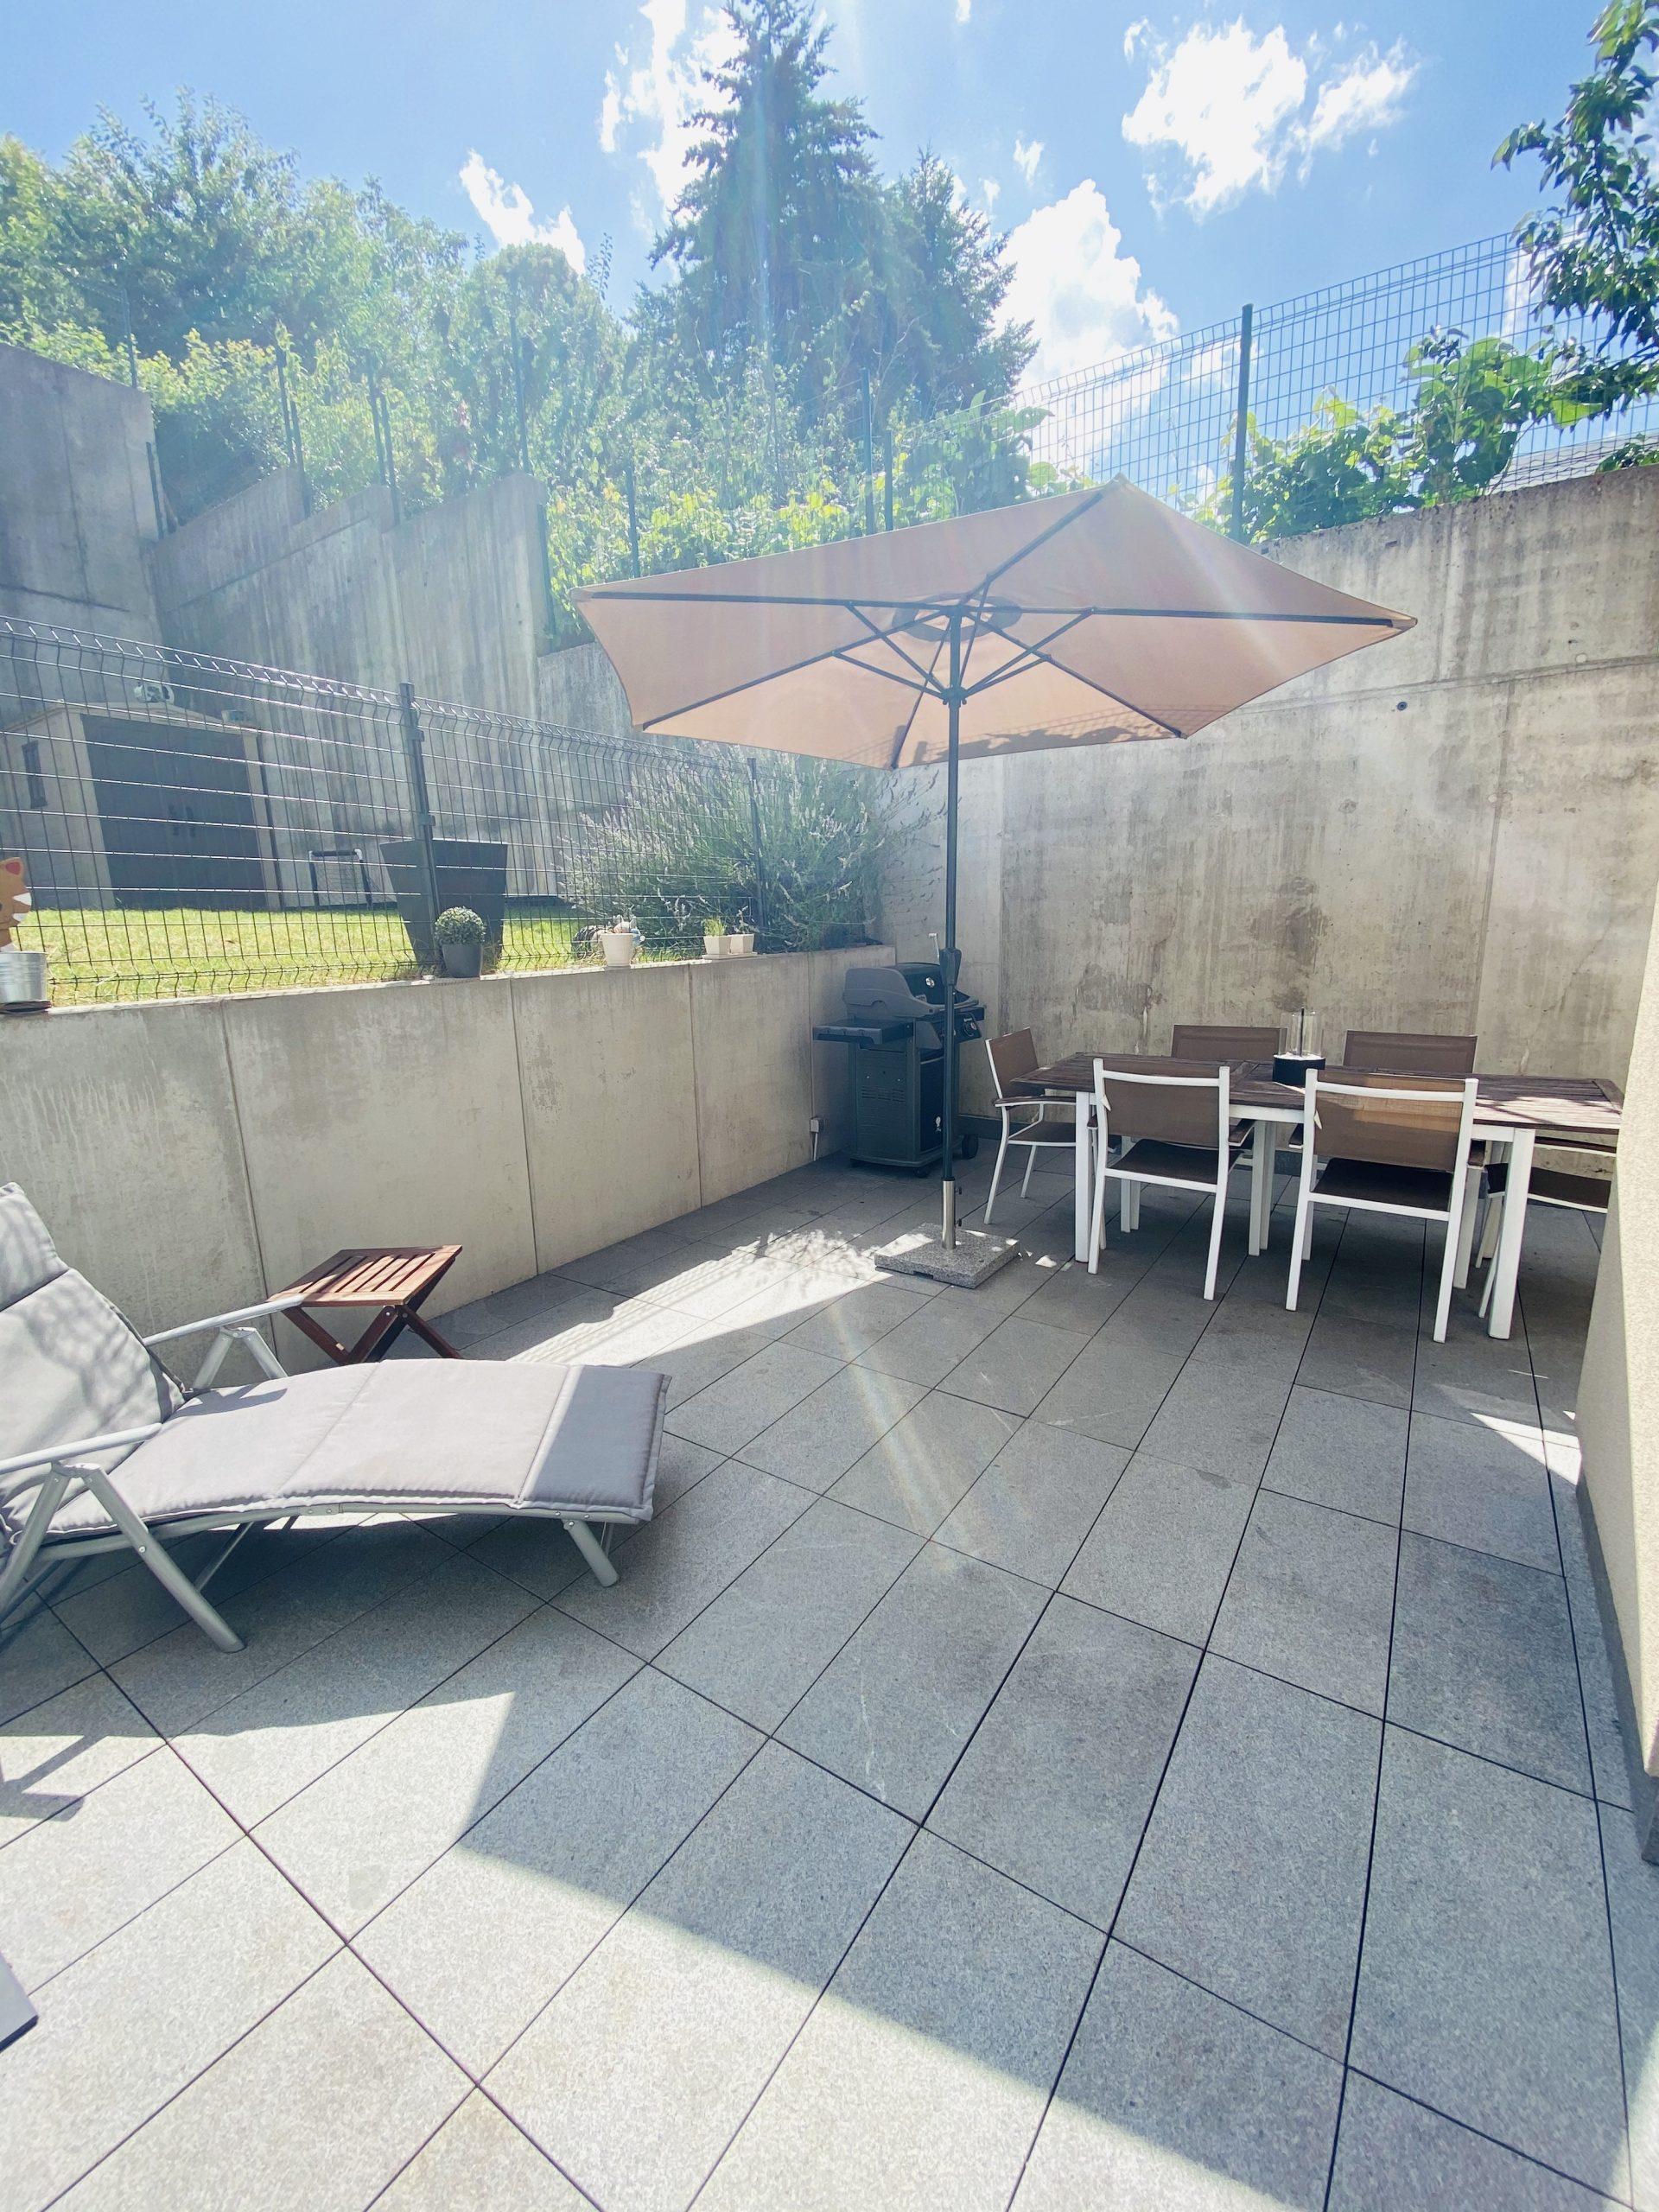 Rodange: Appartement 2 chambres. Terrasse et jardin privatif.